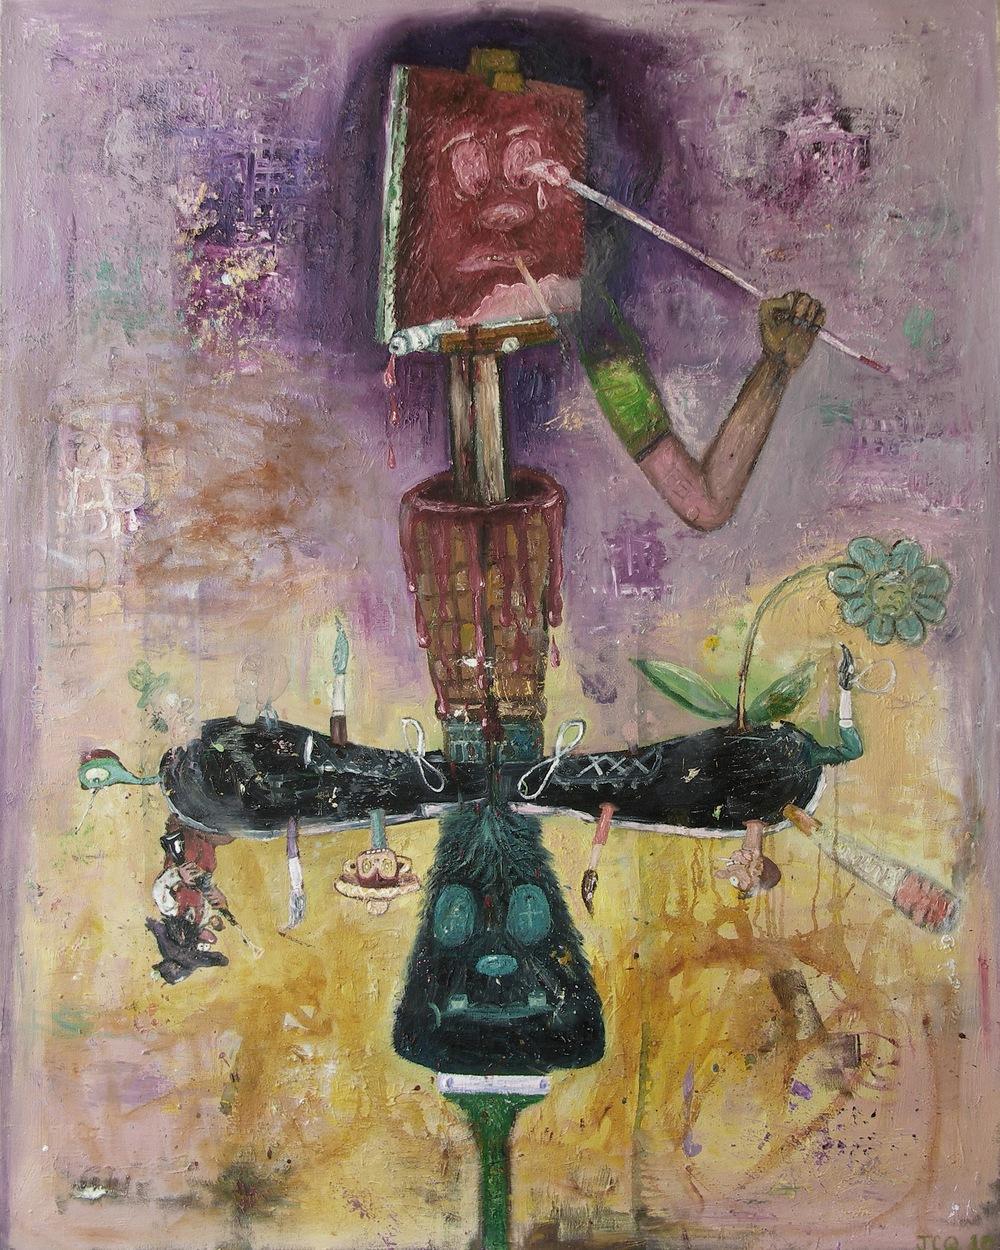 Untitled (self potrait as a failed painting) oil on canvas, 2010.jpg